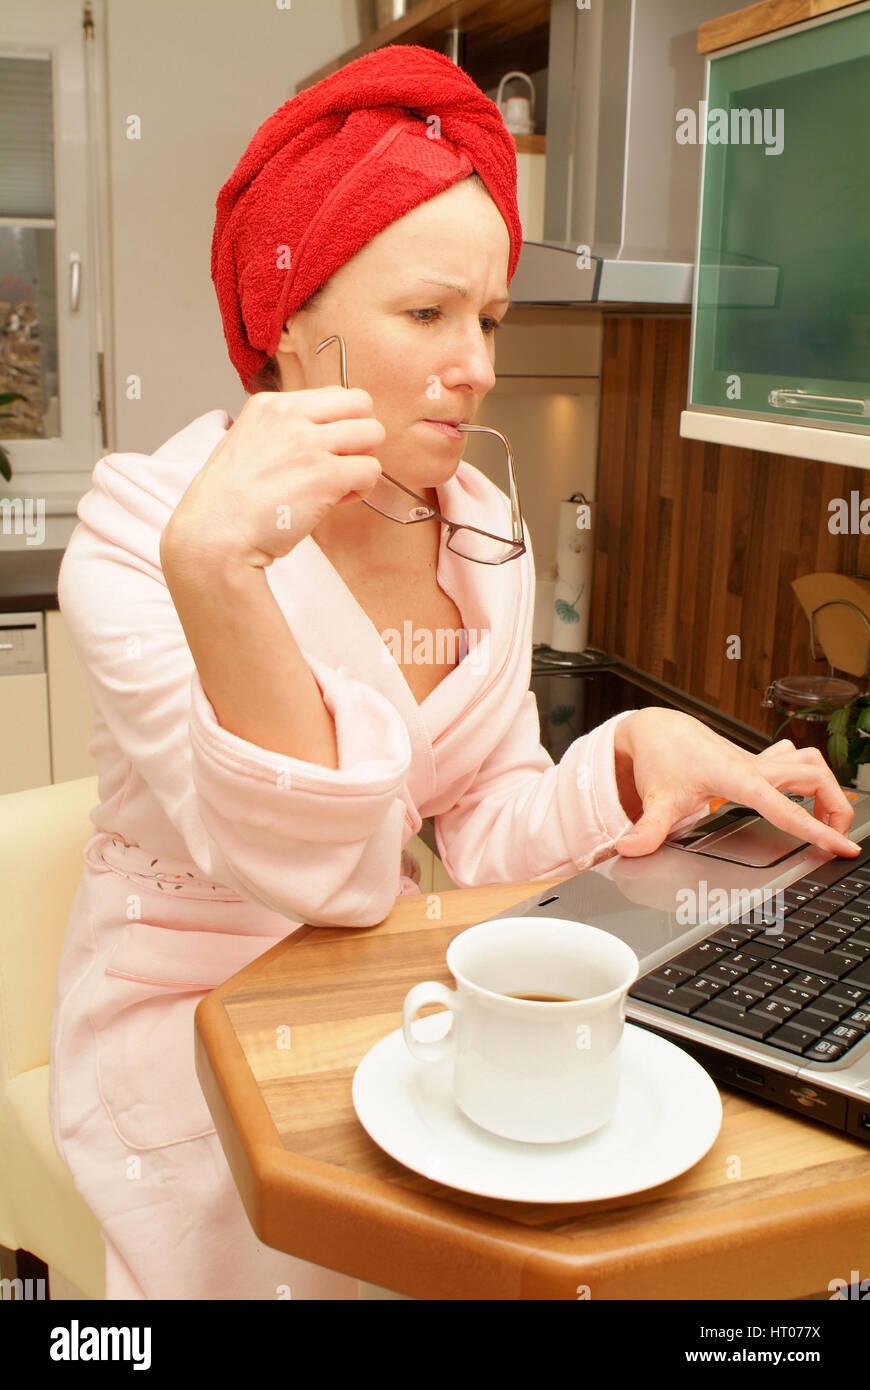 Junge Frau im Morgenmantel sitzt an der Kuechenbar und arbeitet am Notebook - young woman at home using laptop - Stock Image